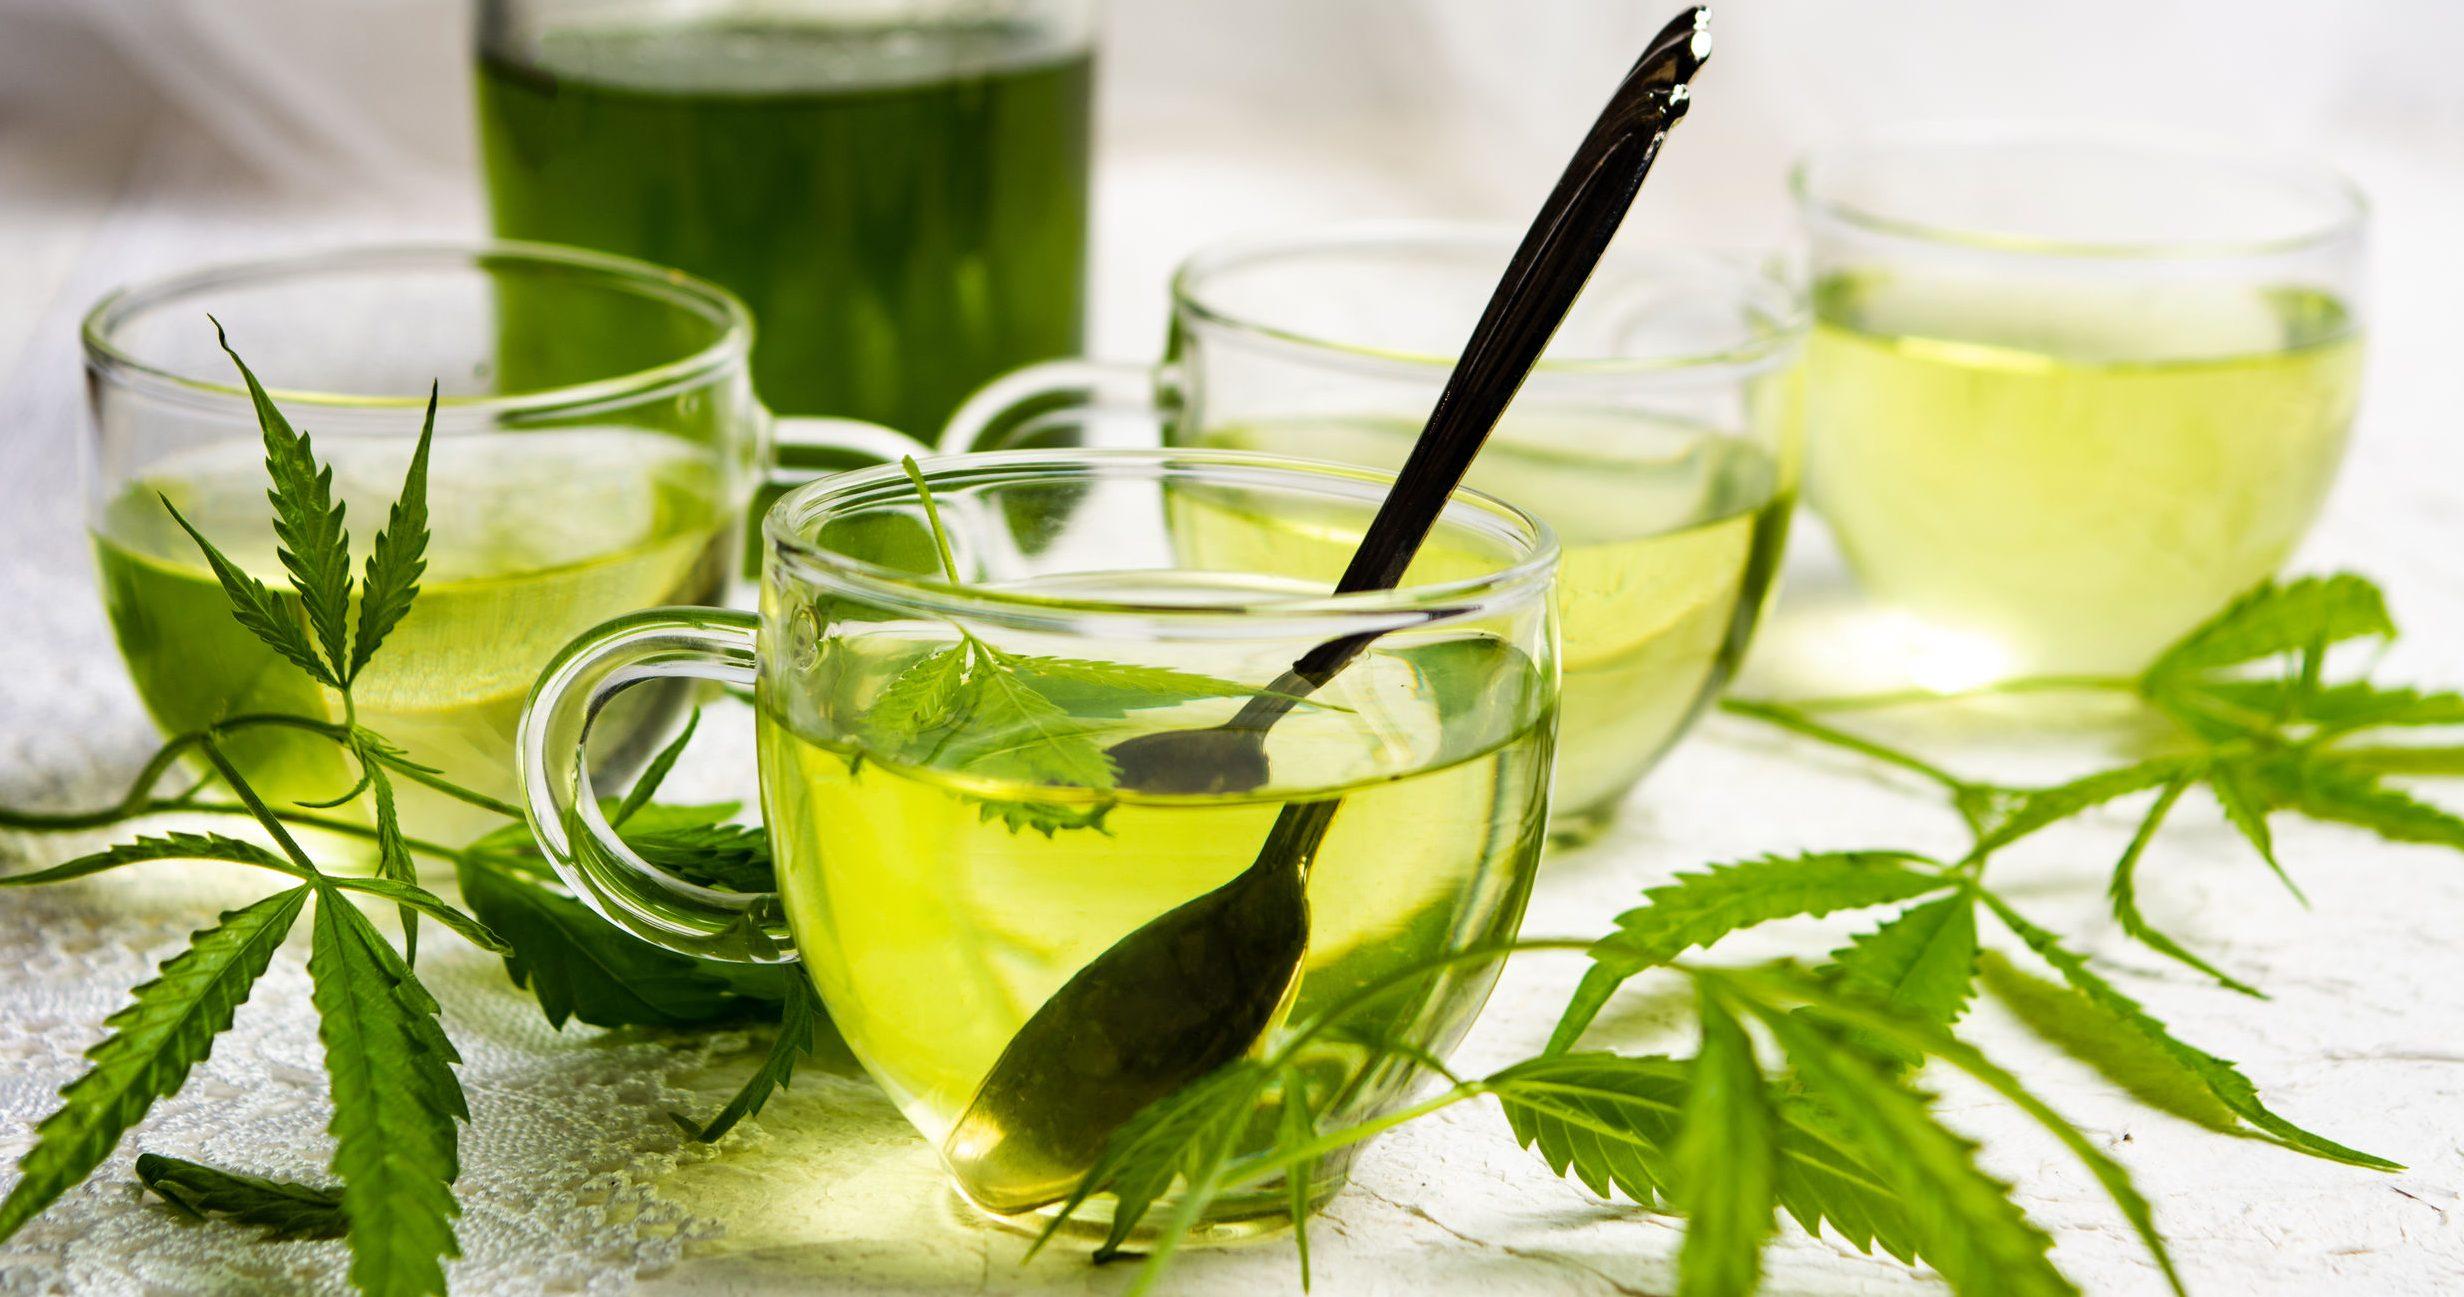 Cannabis herbal tea served in glass teacups